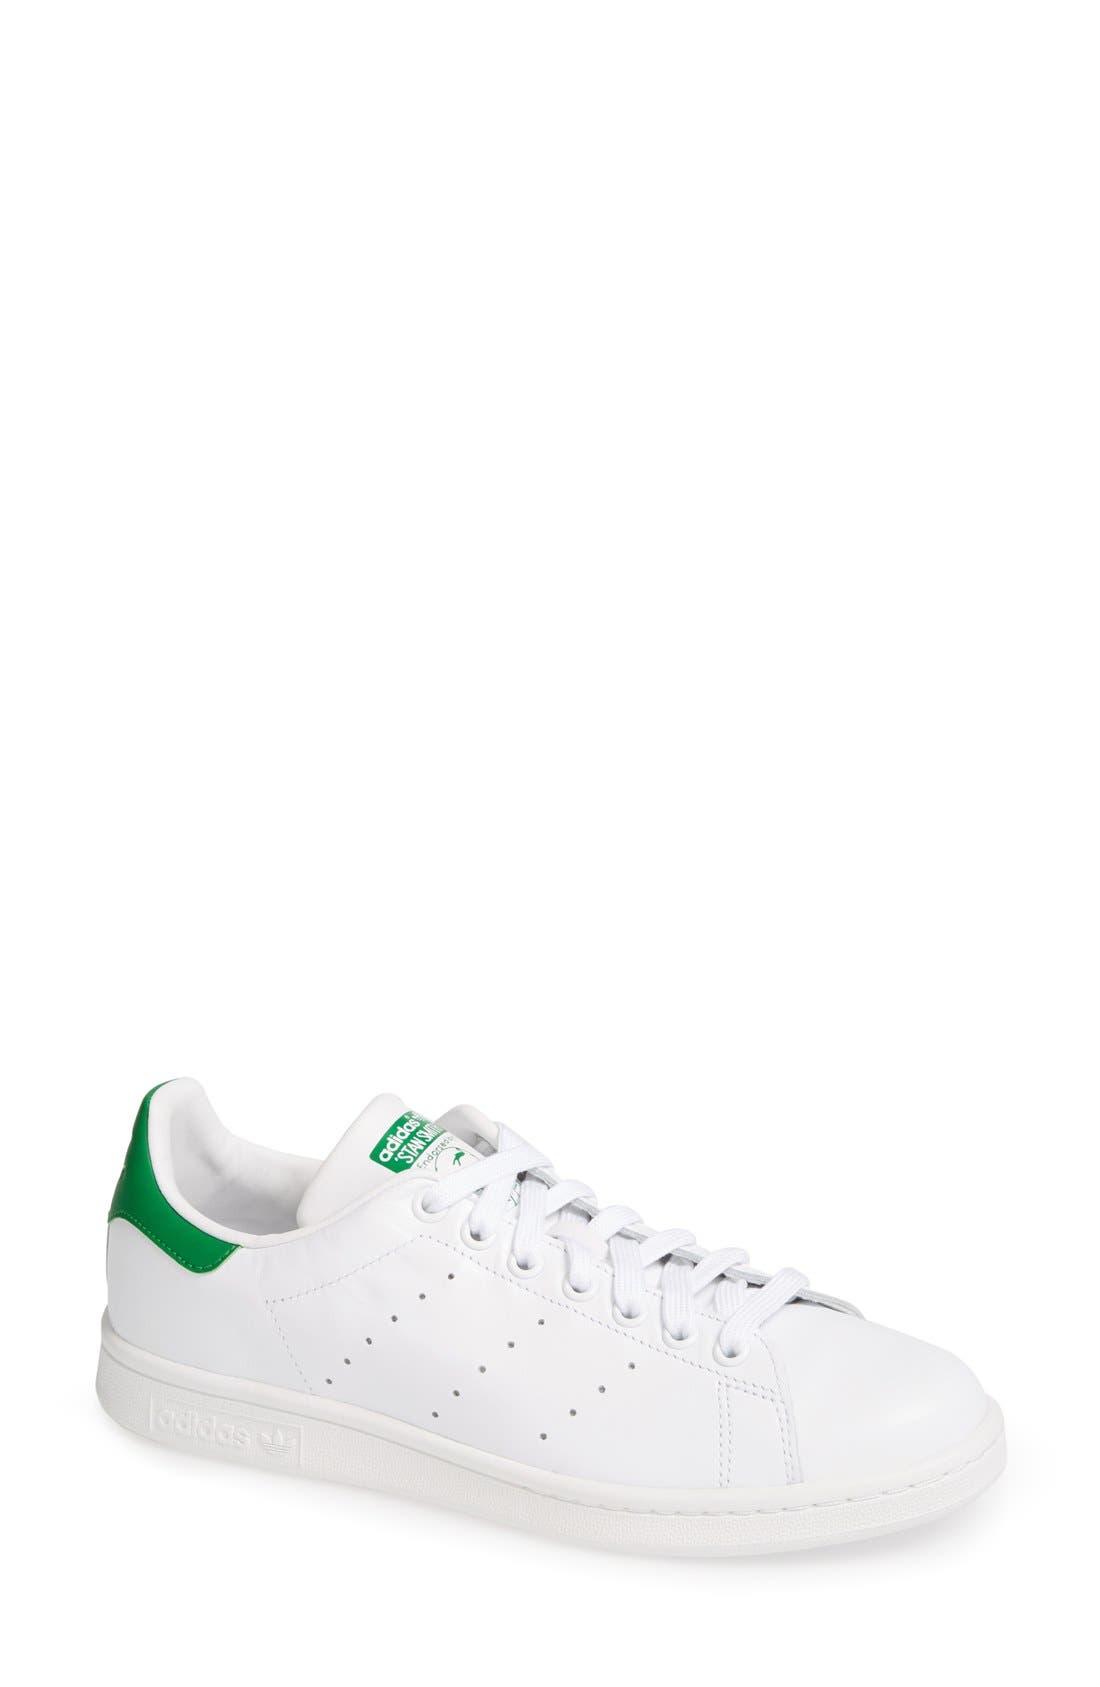 Women's White Shoes Sale \u0026 Clearance